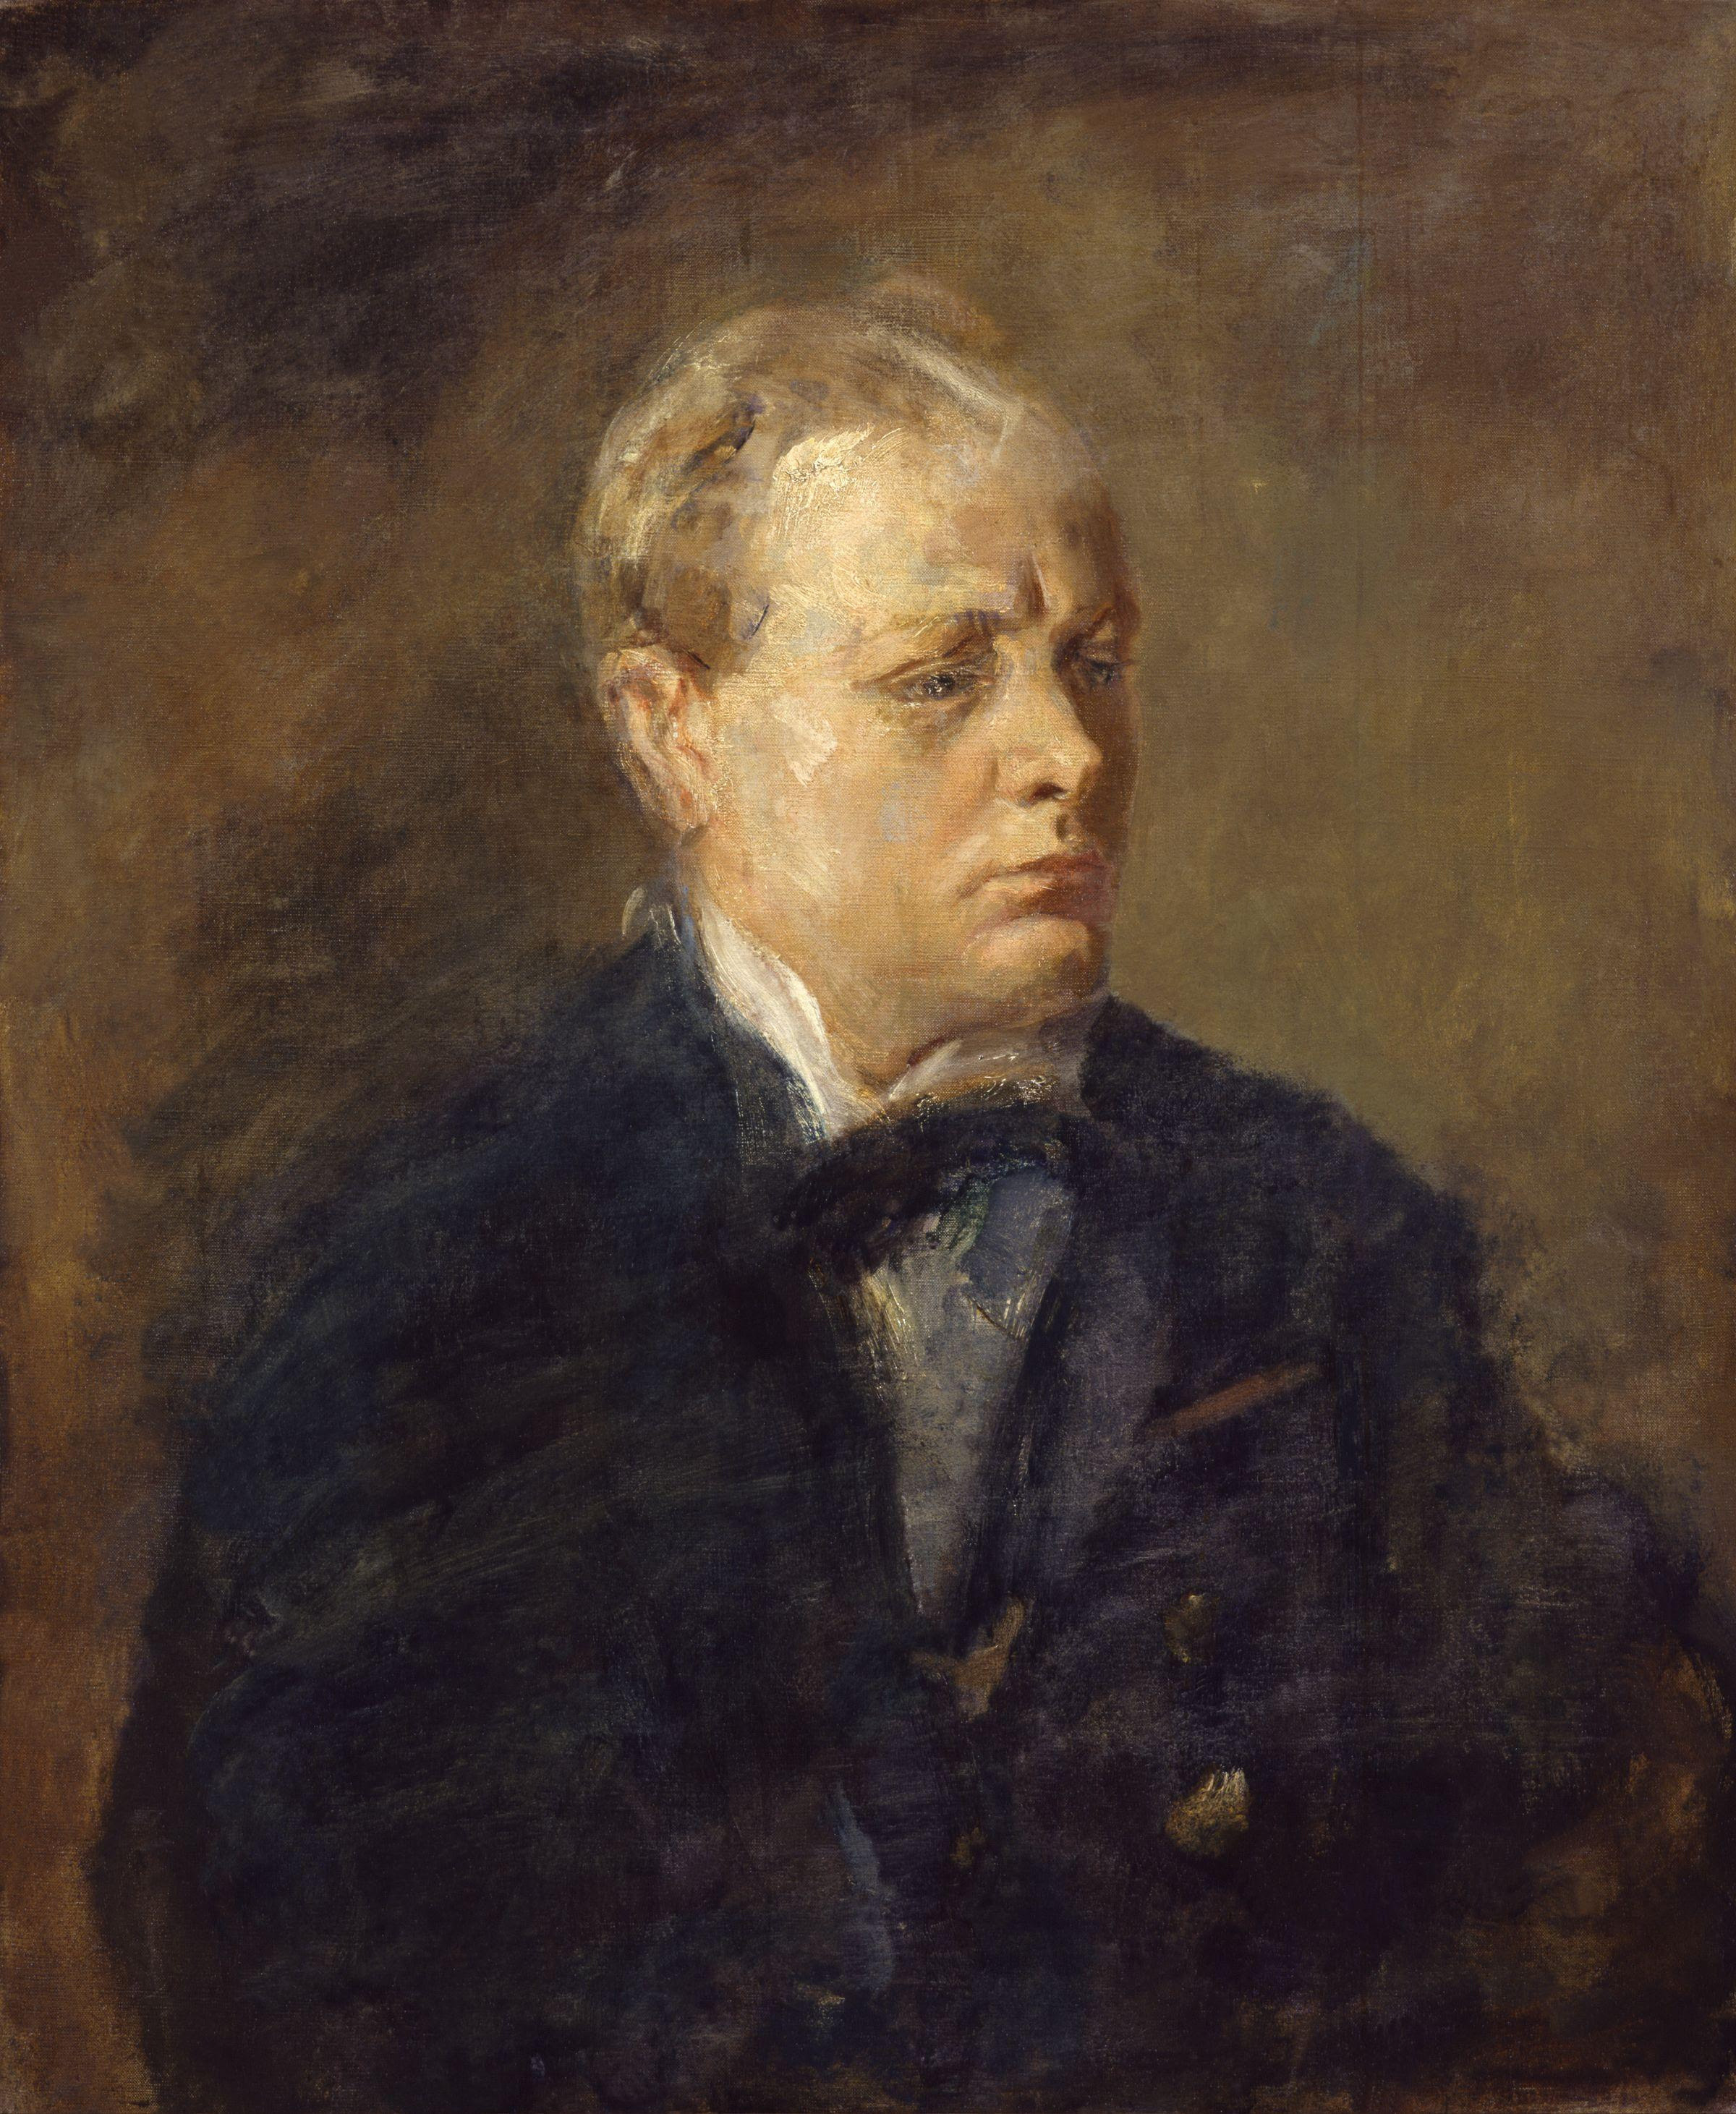 Ambrose McEvoy: Sir Winston Leonard Spencer Churchill